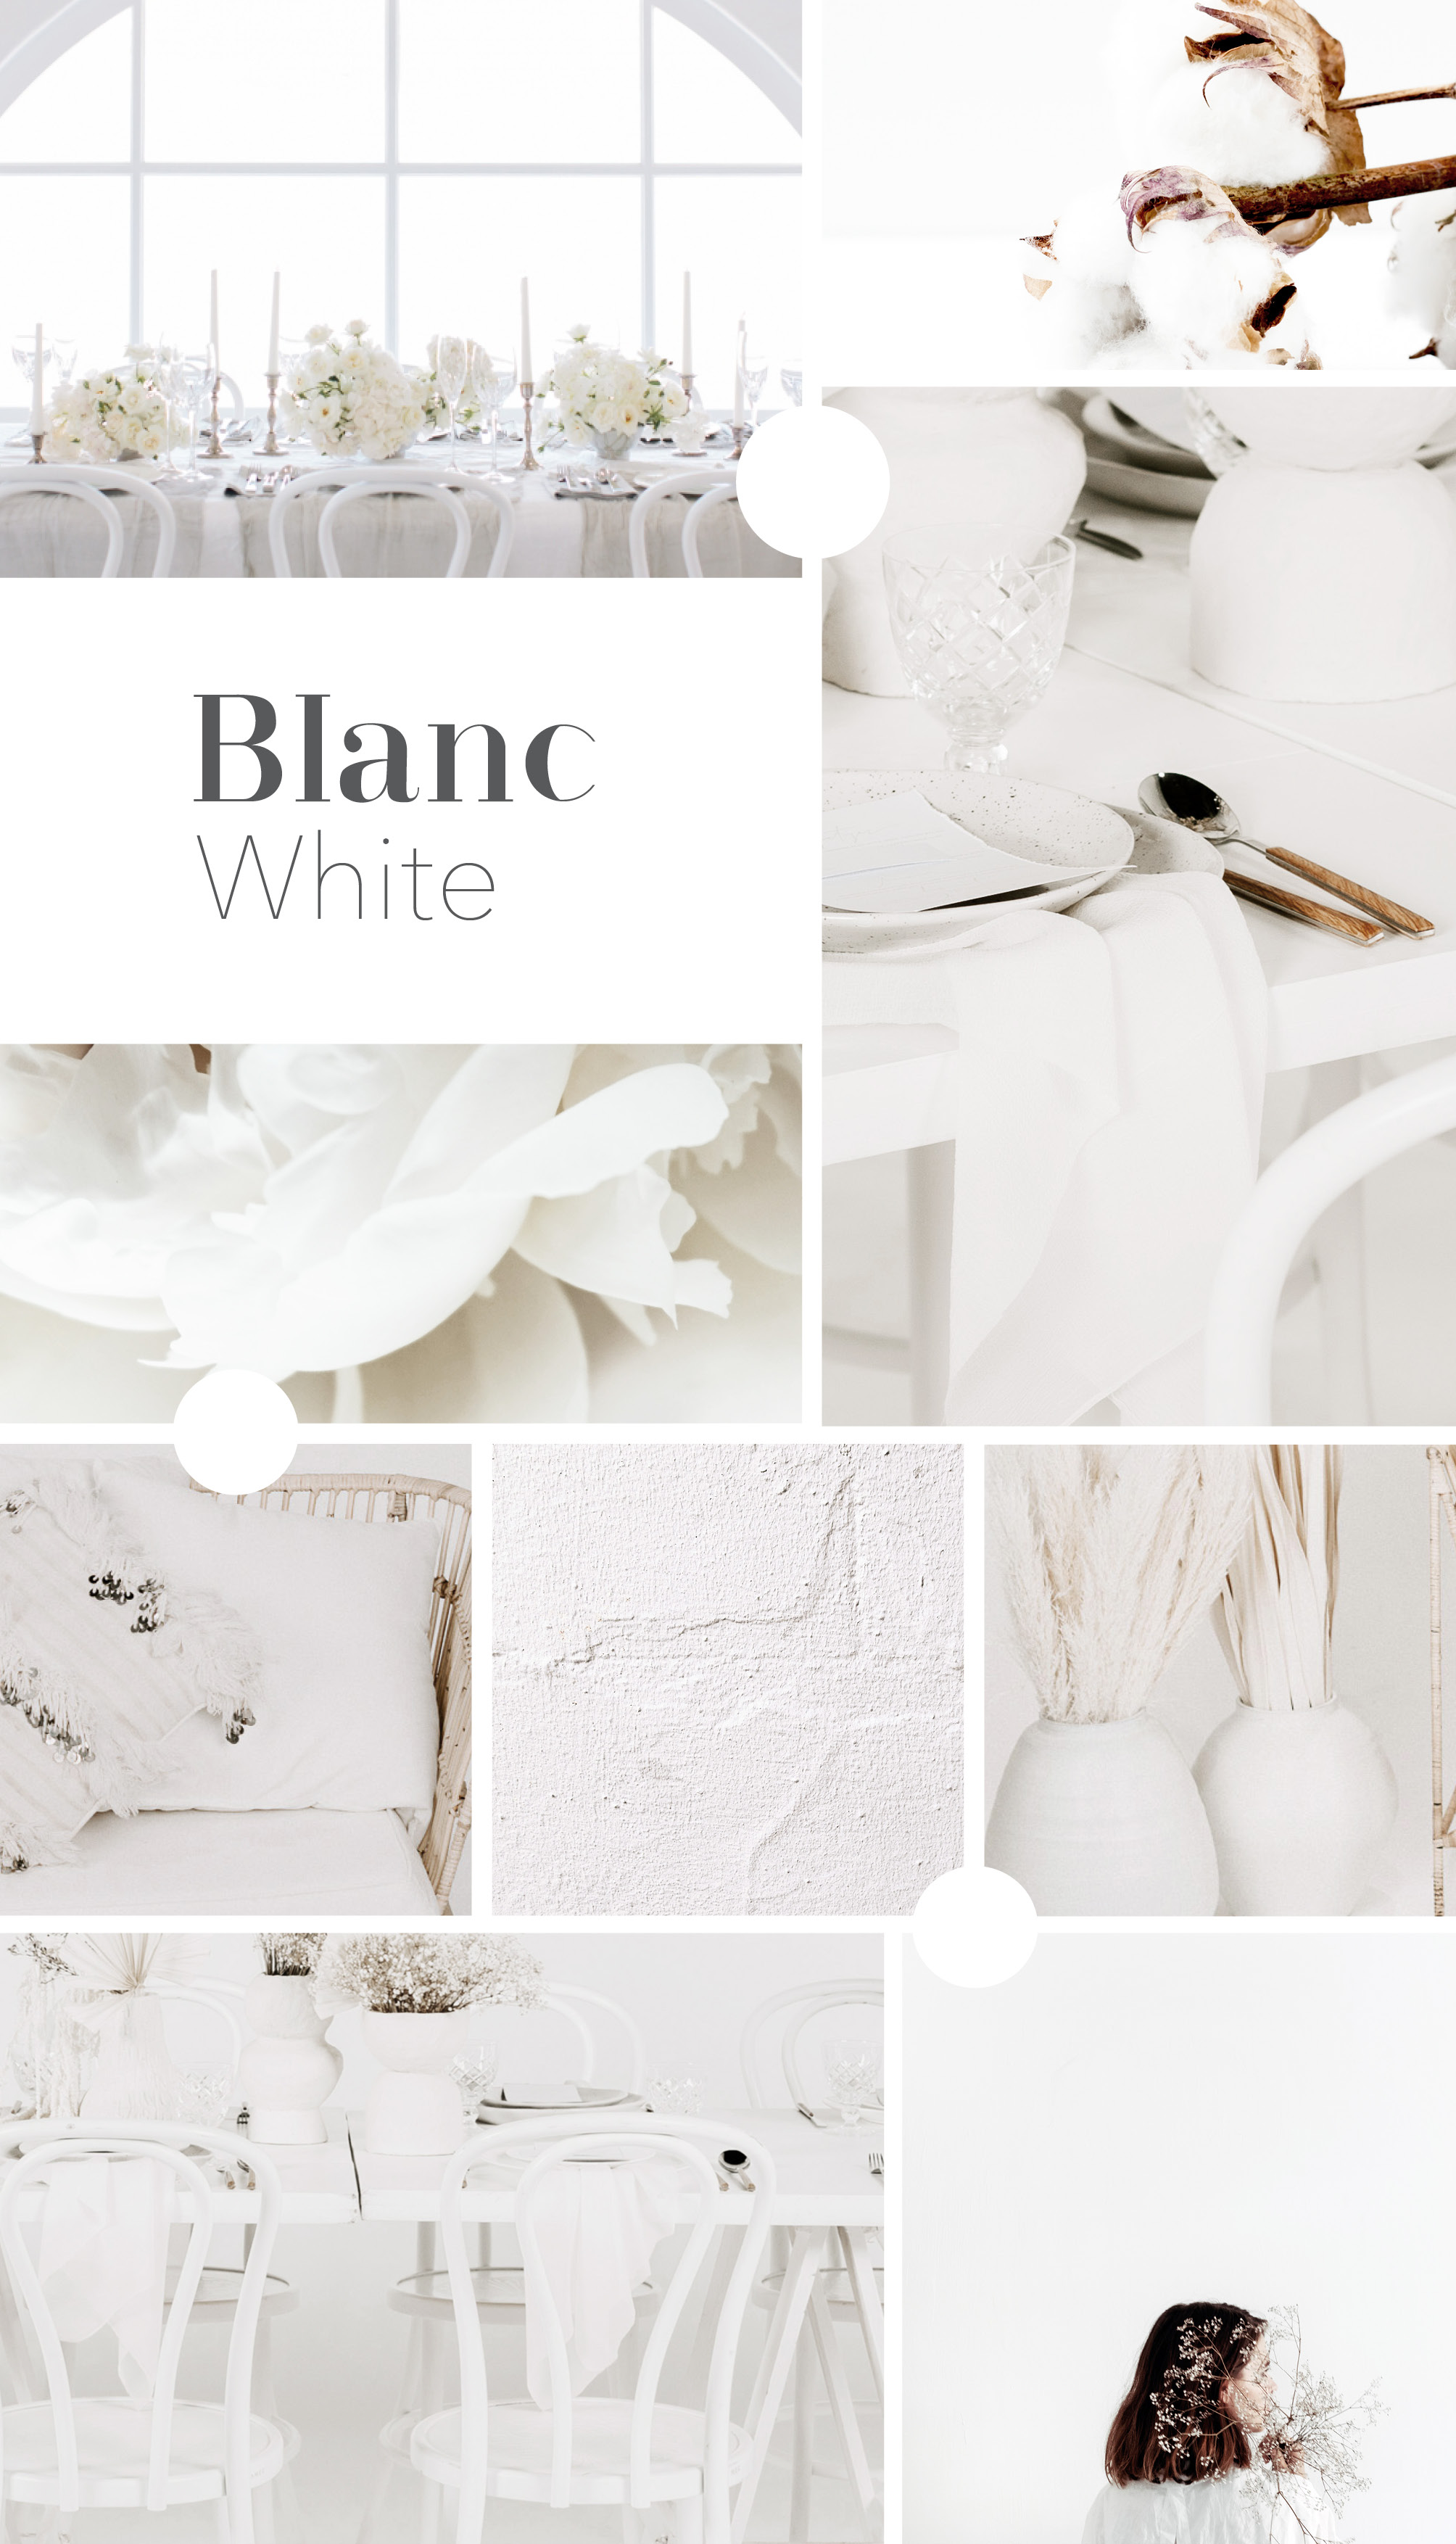 White White_minimal_moodboard.jpg